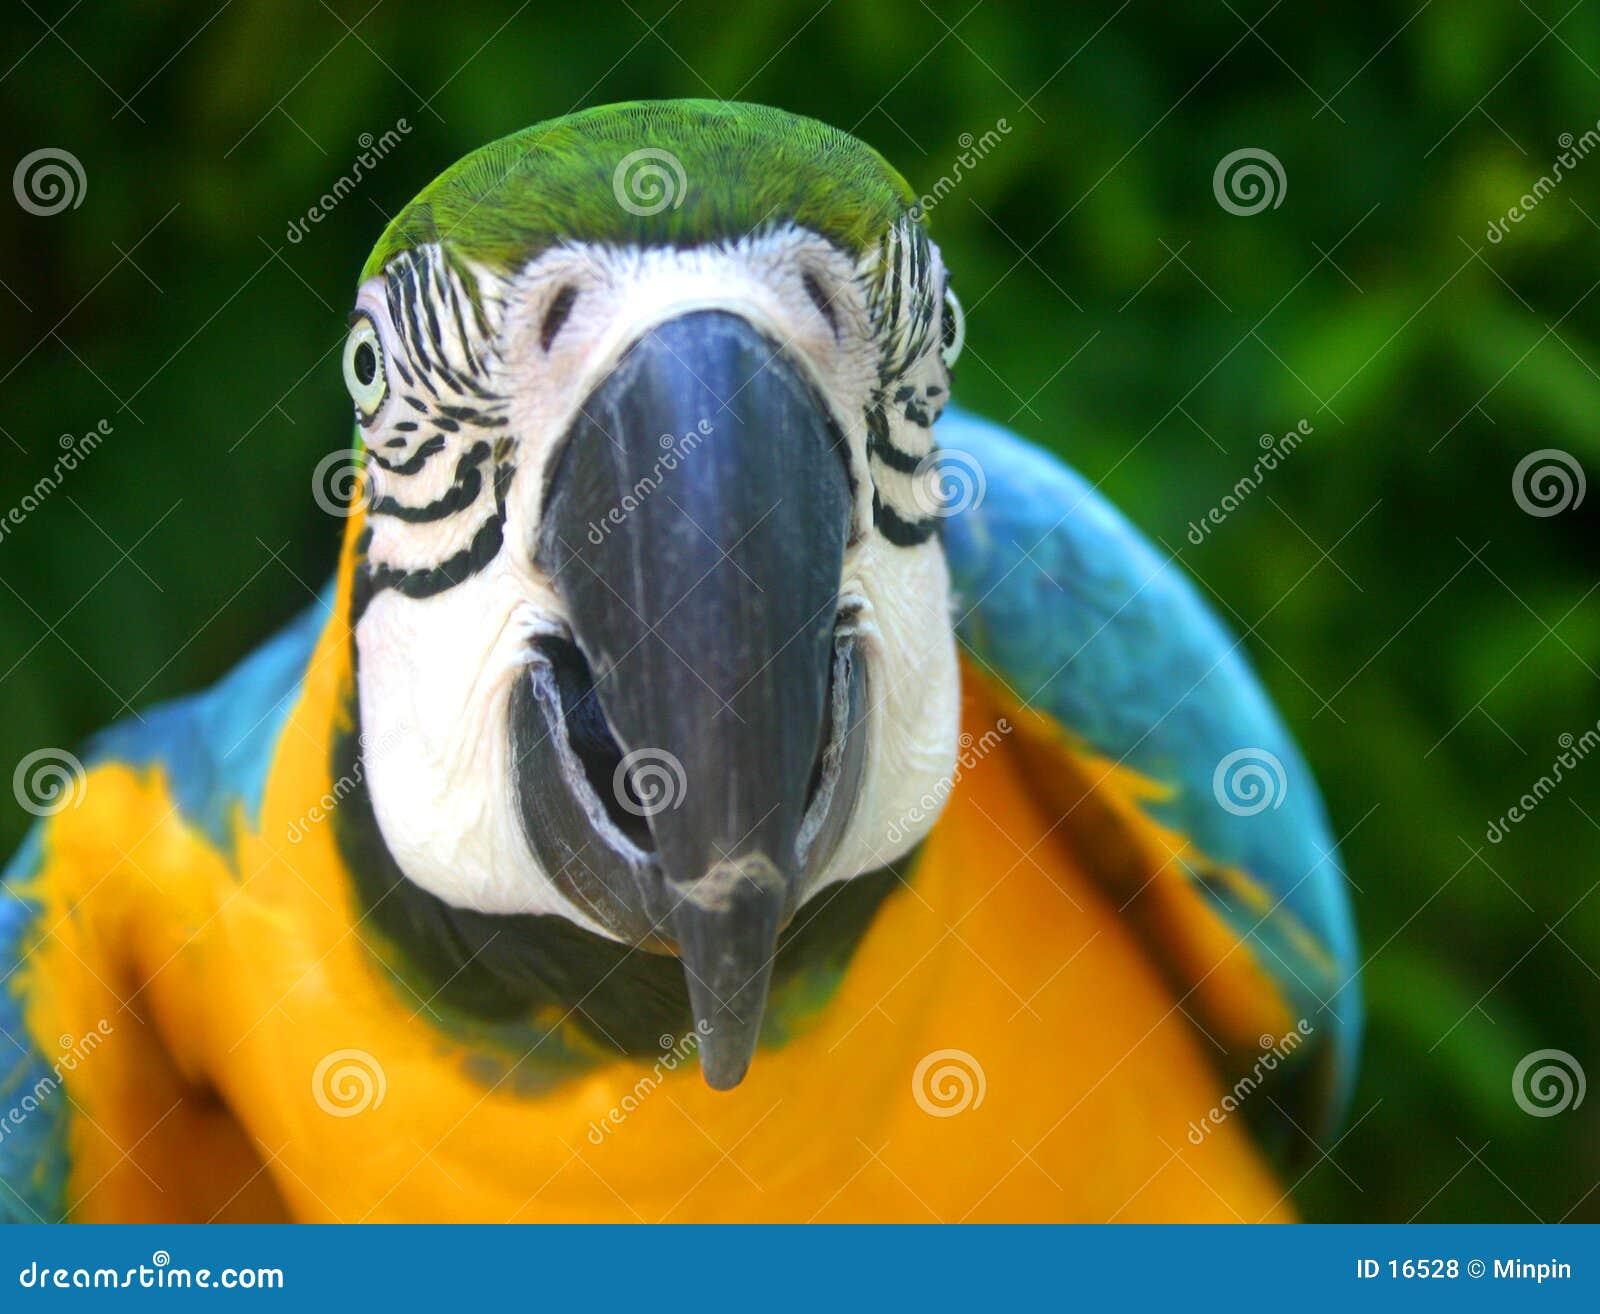 Papagaio do Macaw